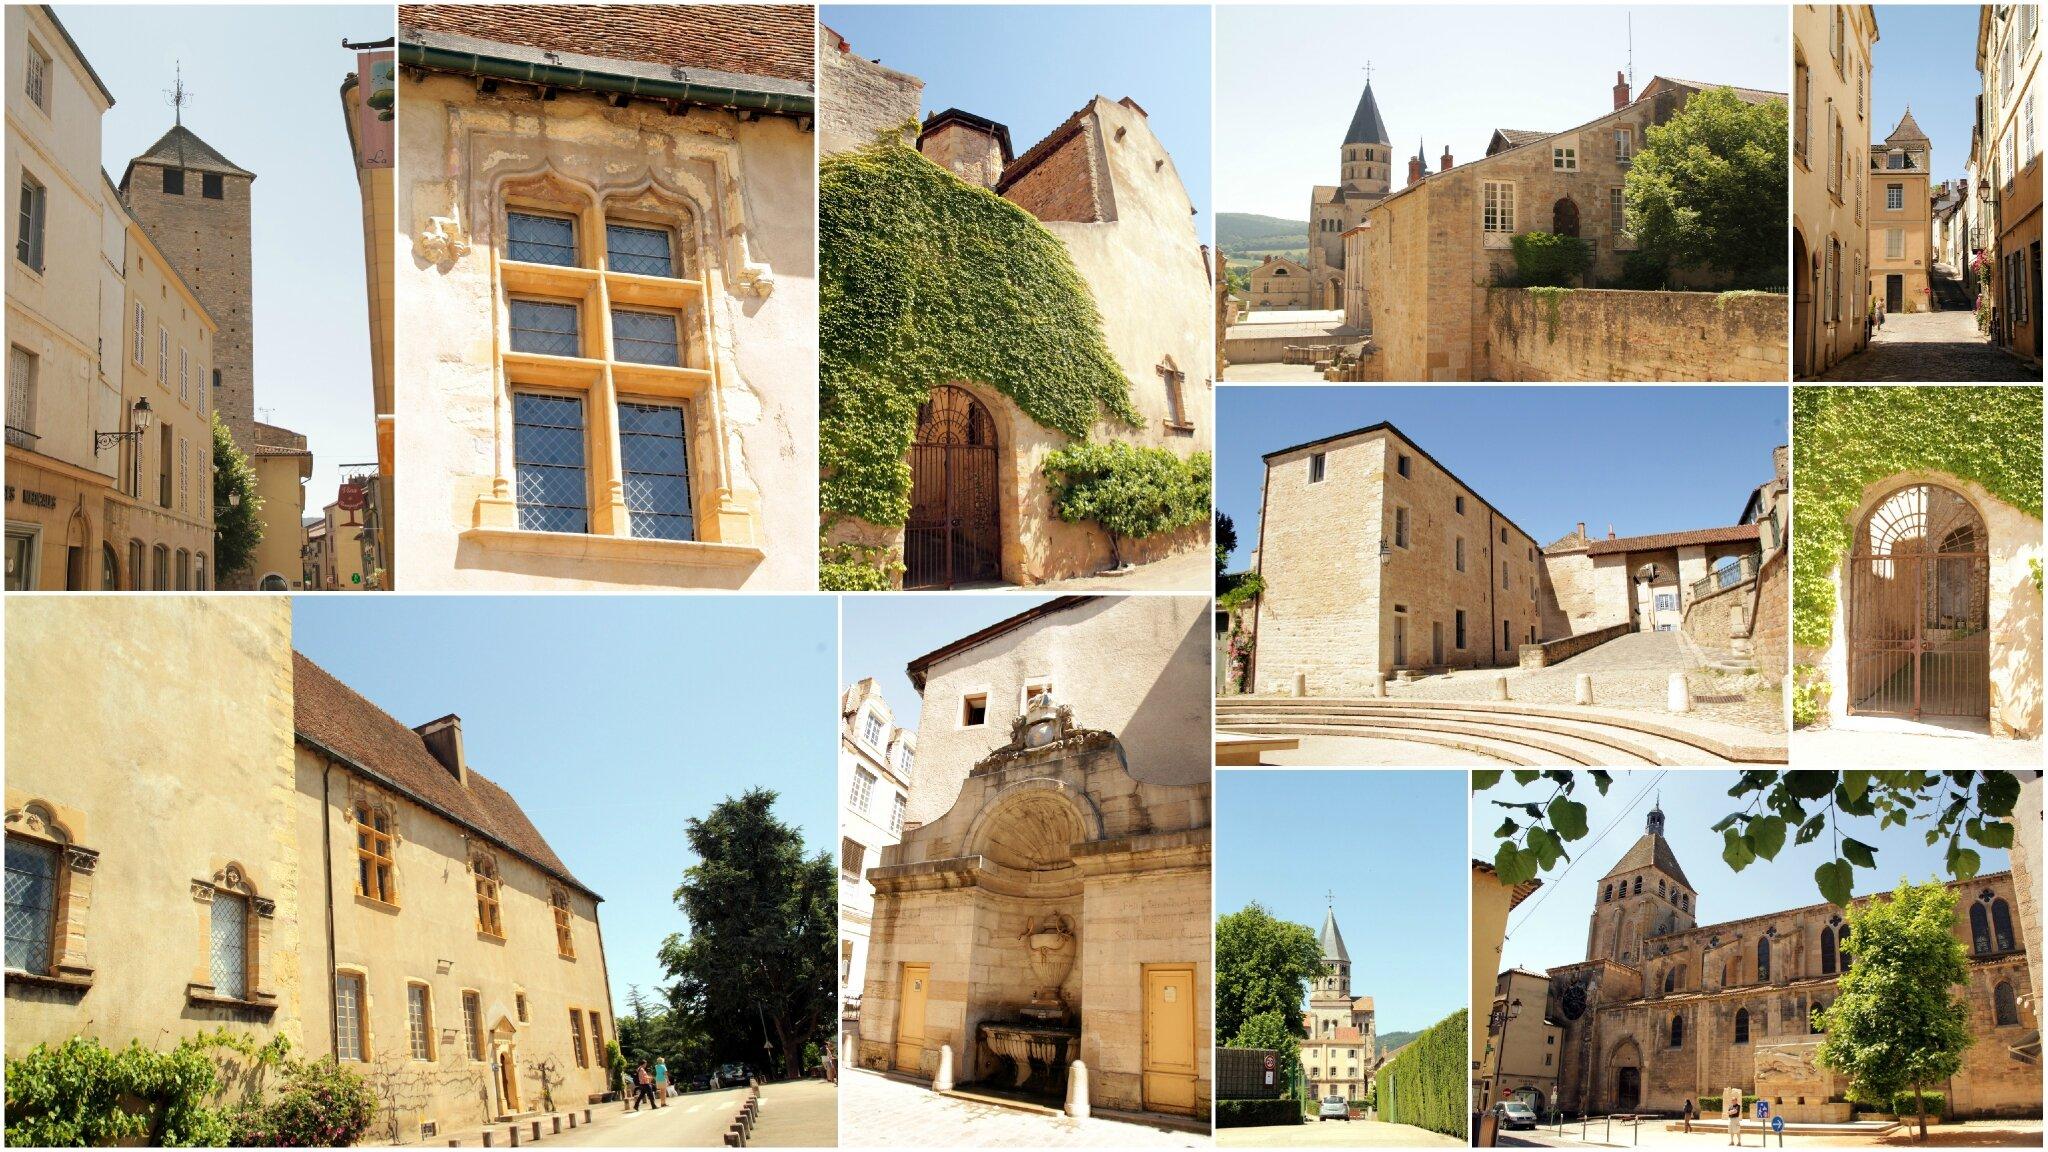 Cluny, son village et son abbaye